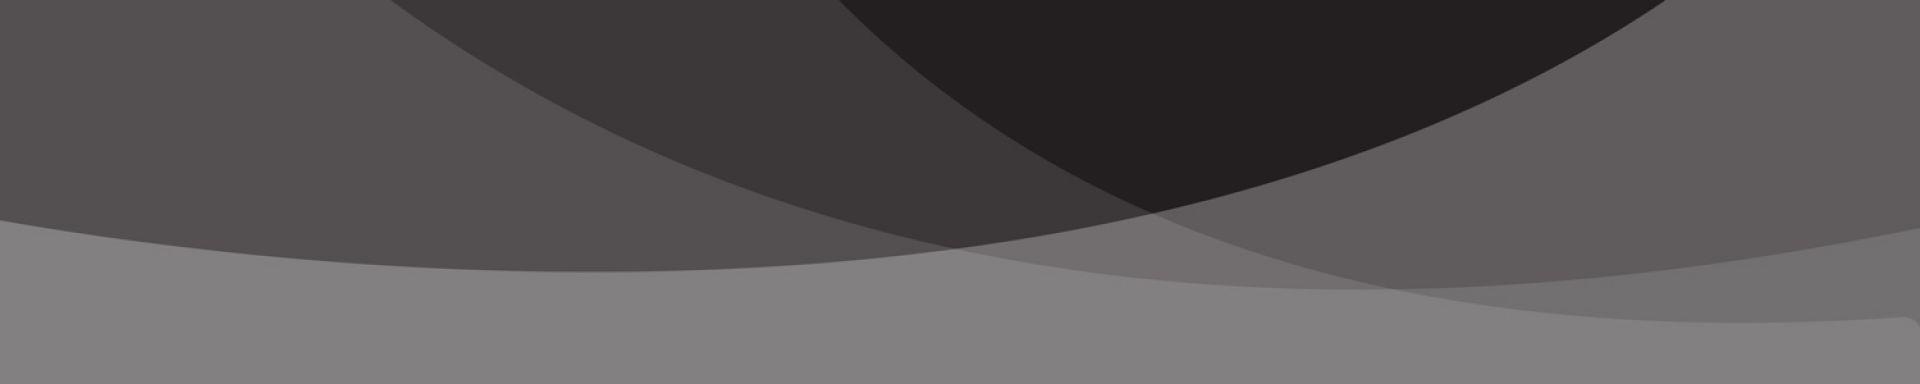 Ripple background